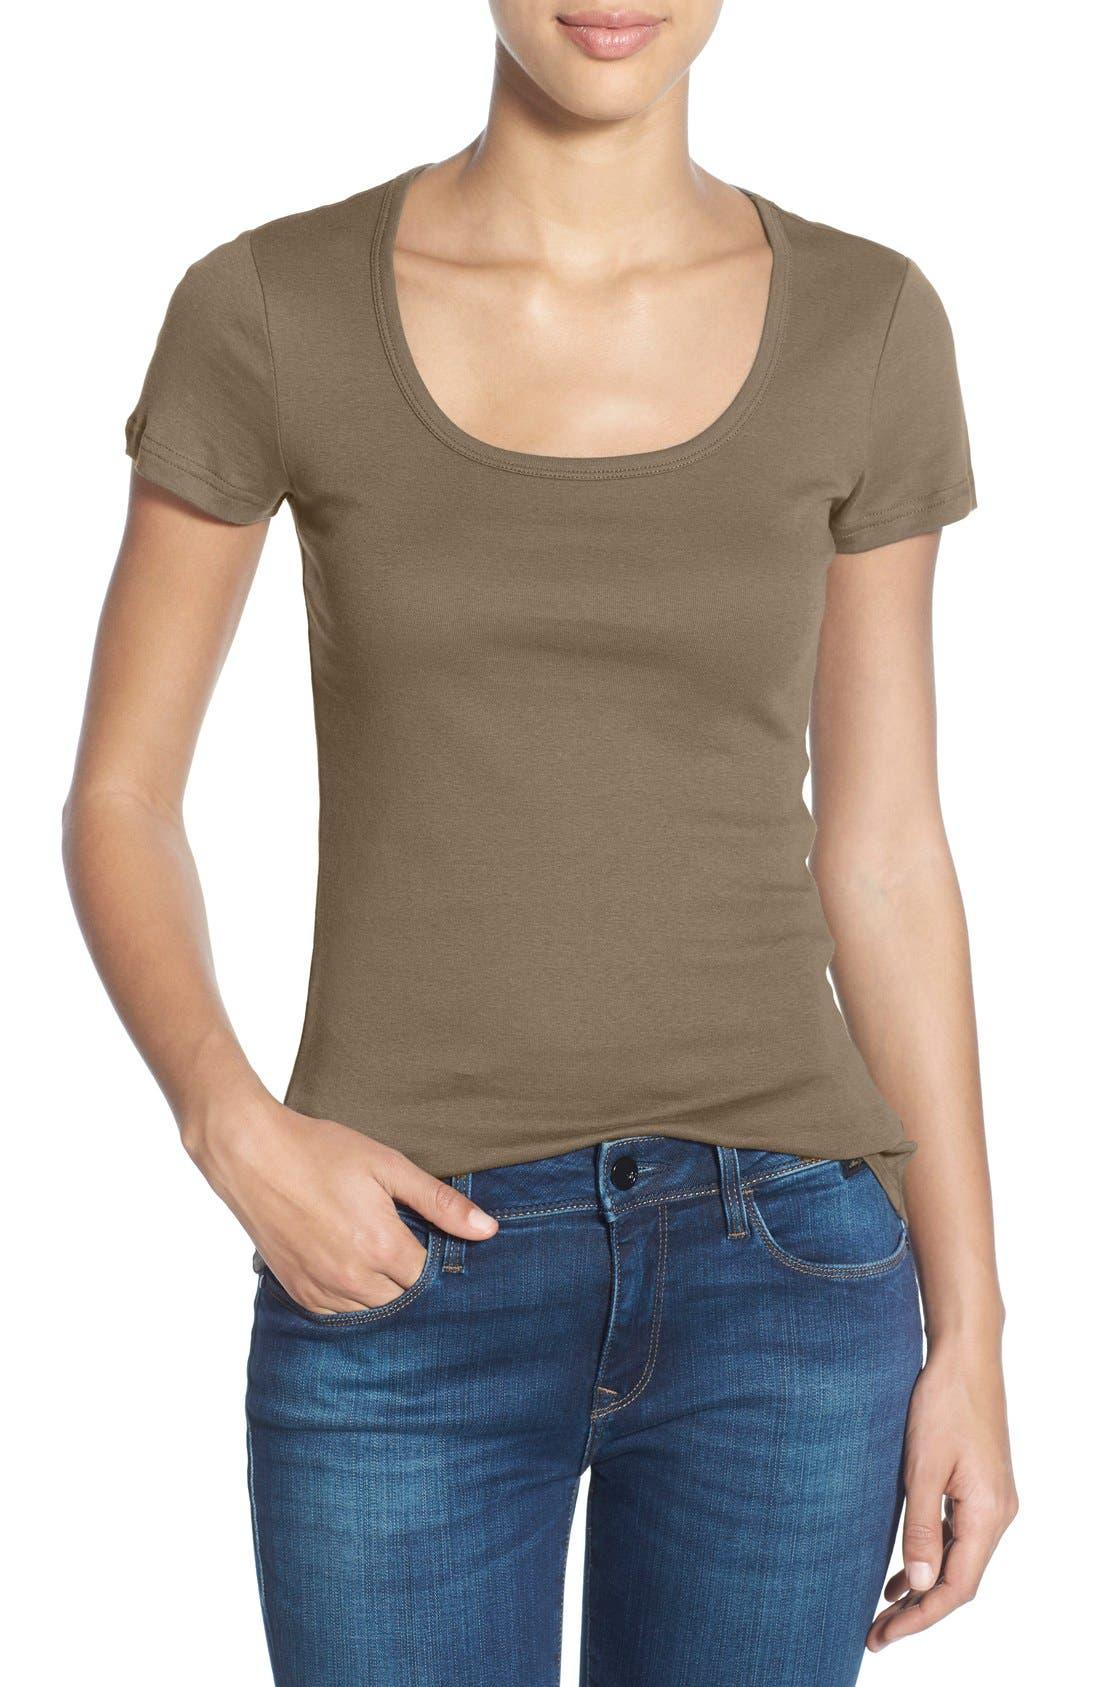 Alternate Image 1 Selected - Caslon® Short Sleeve Scoop Neck Tee (Regular & Petite)